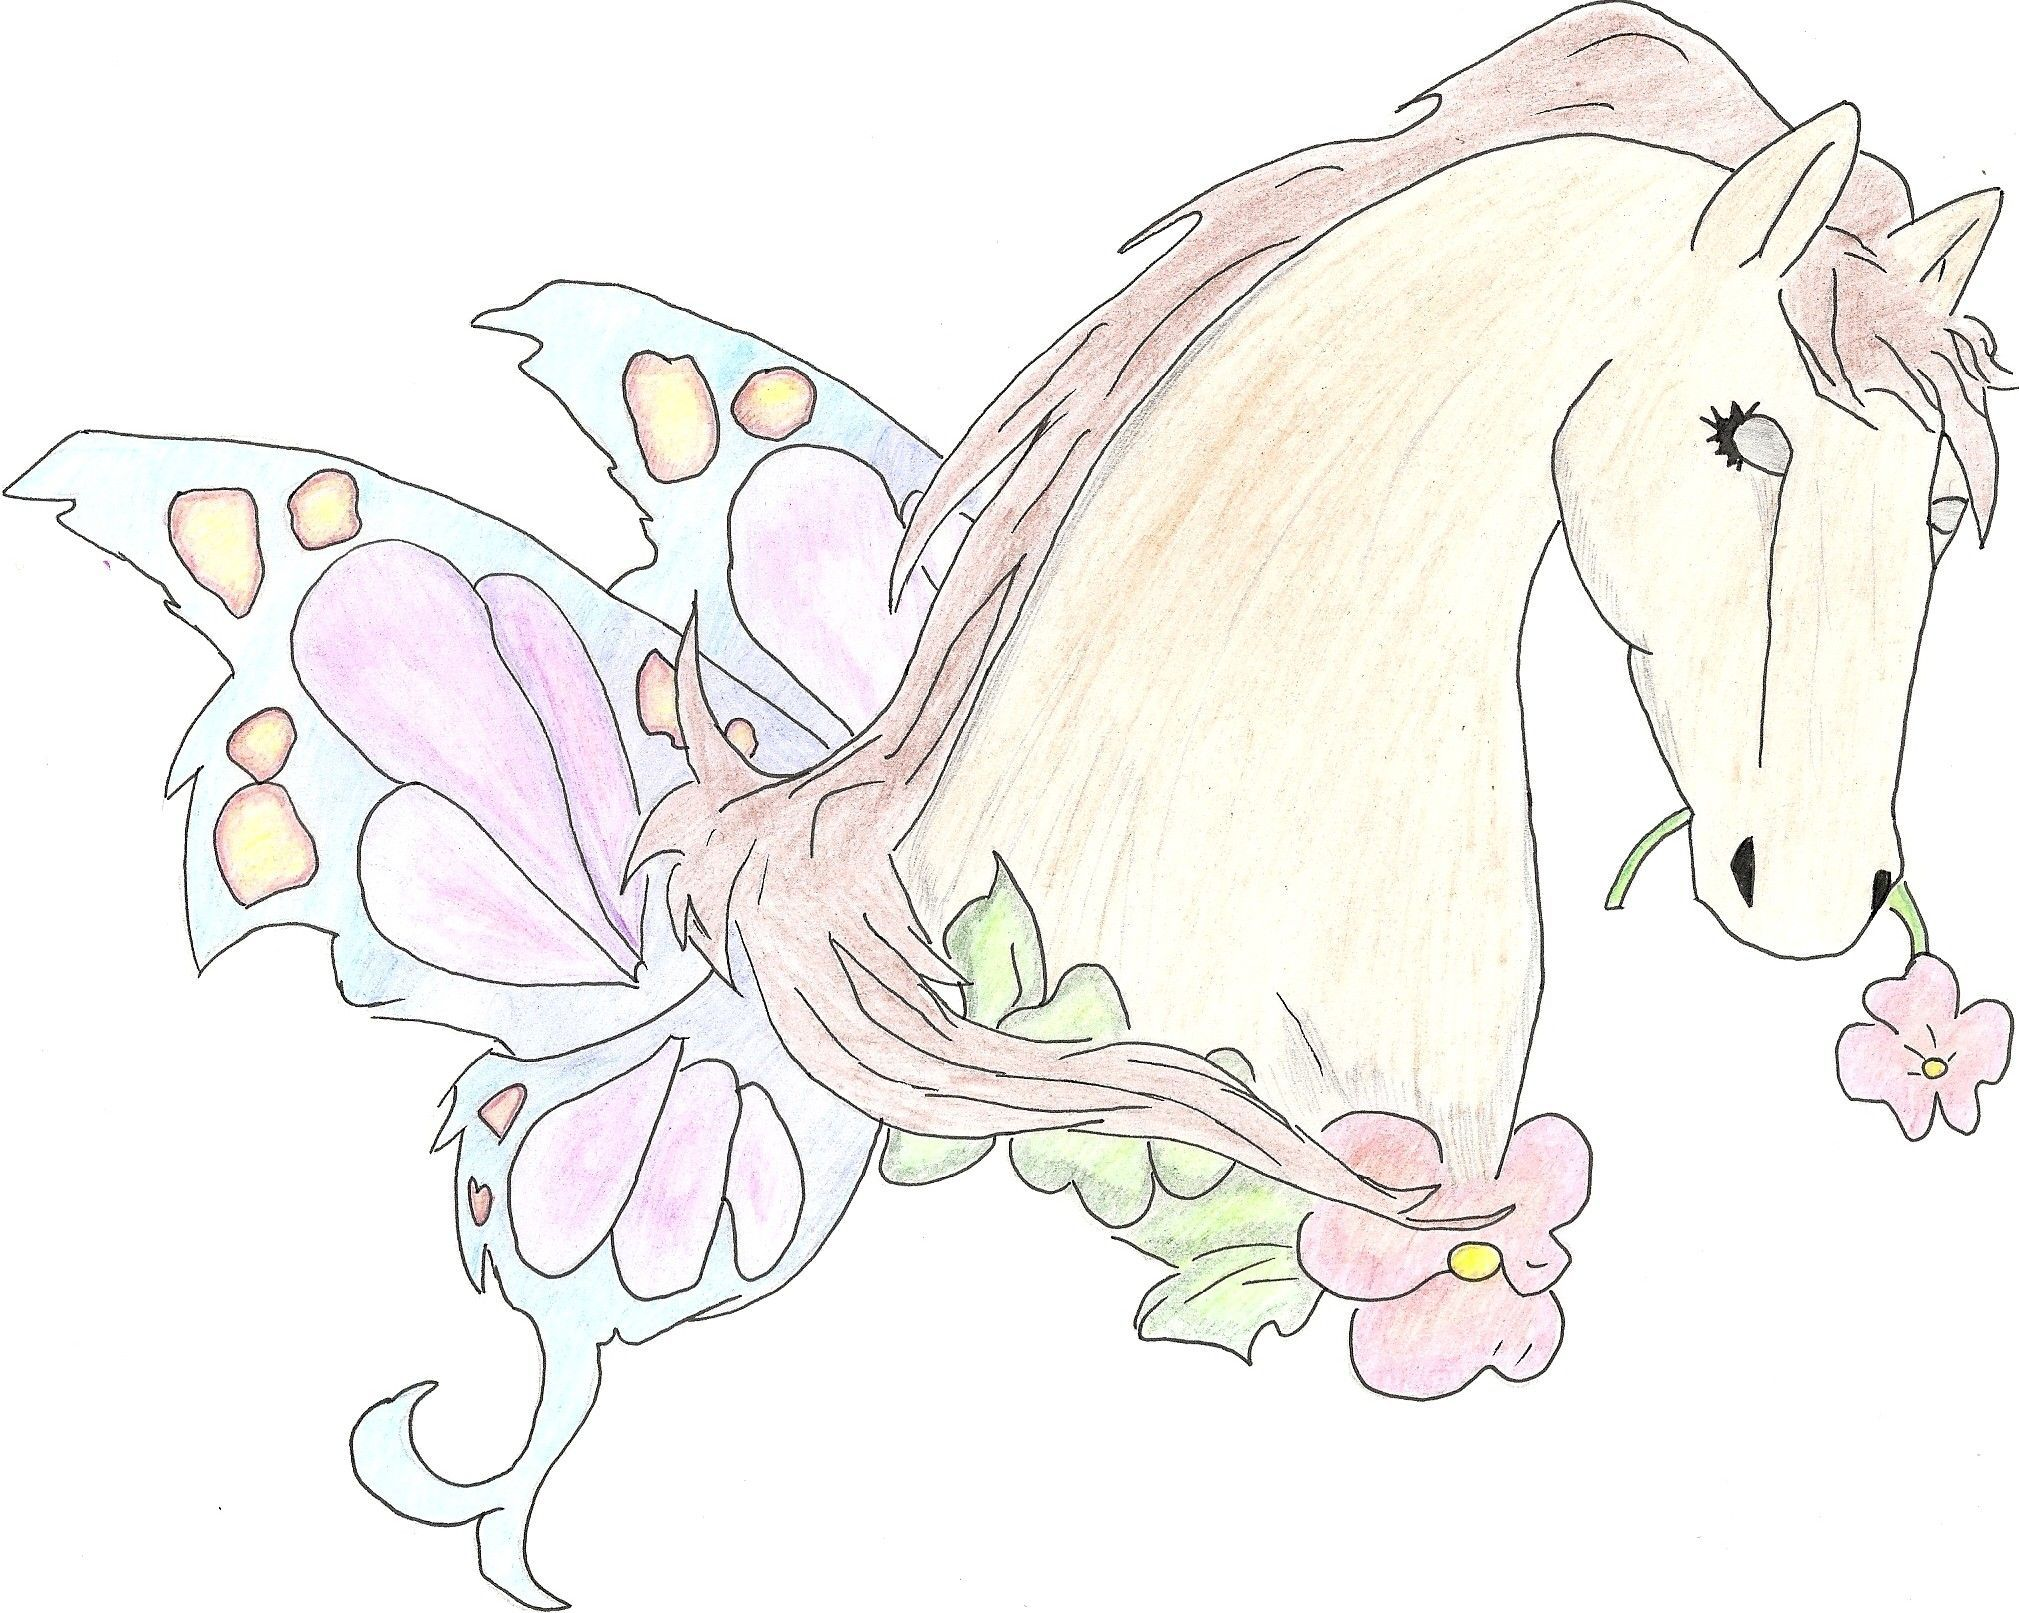 Dessin de fleurs en arabesque pelautscom tattoo tattooskid - Fleur en dessin ...